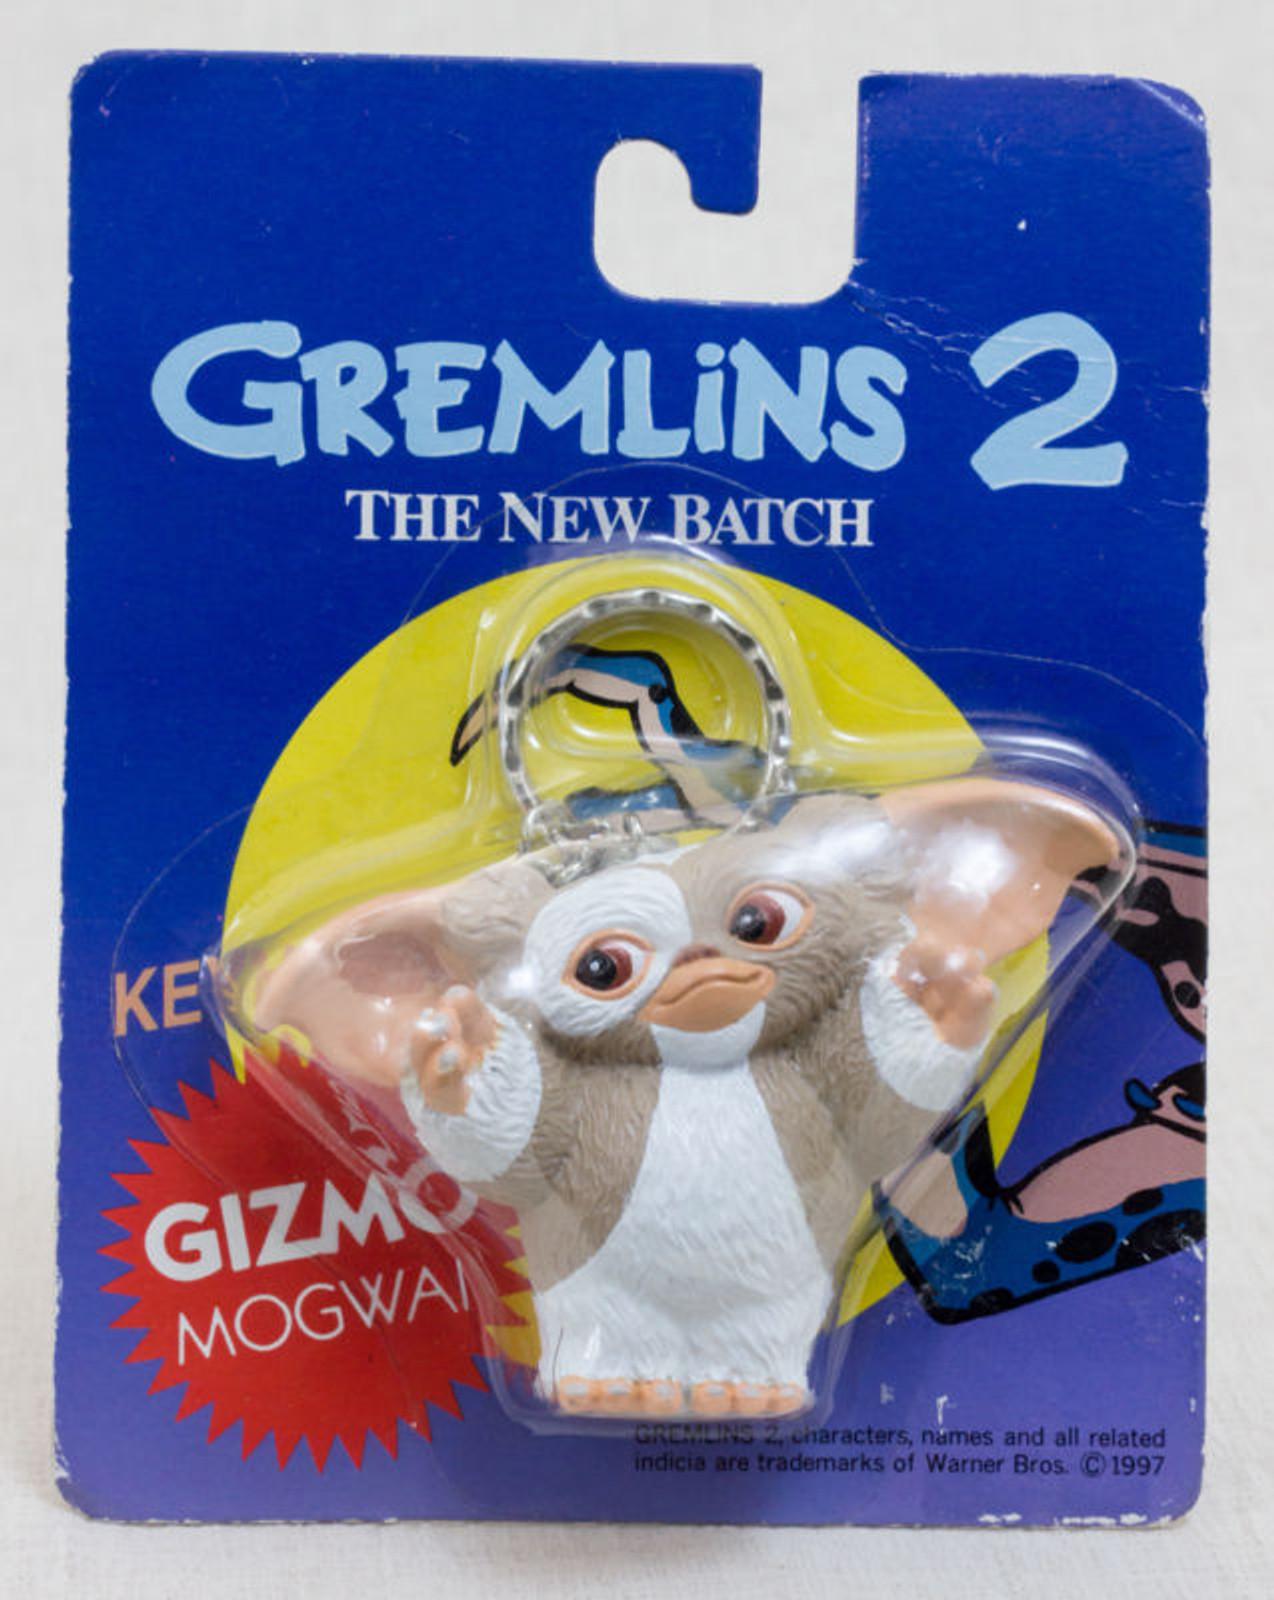 Gremlins 2 The New Batch Gizmo Figure Key Chain Jun Planning JAPAN